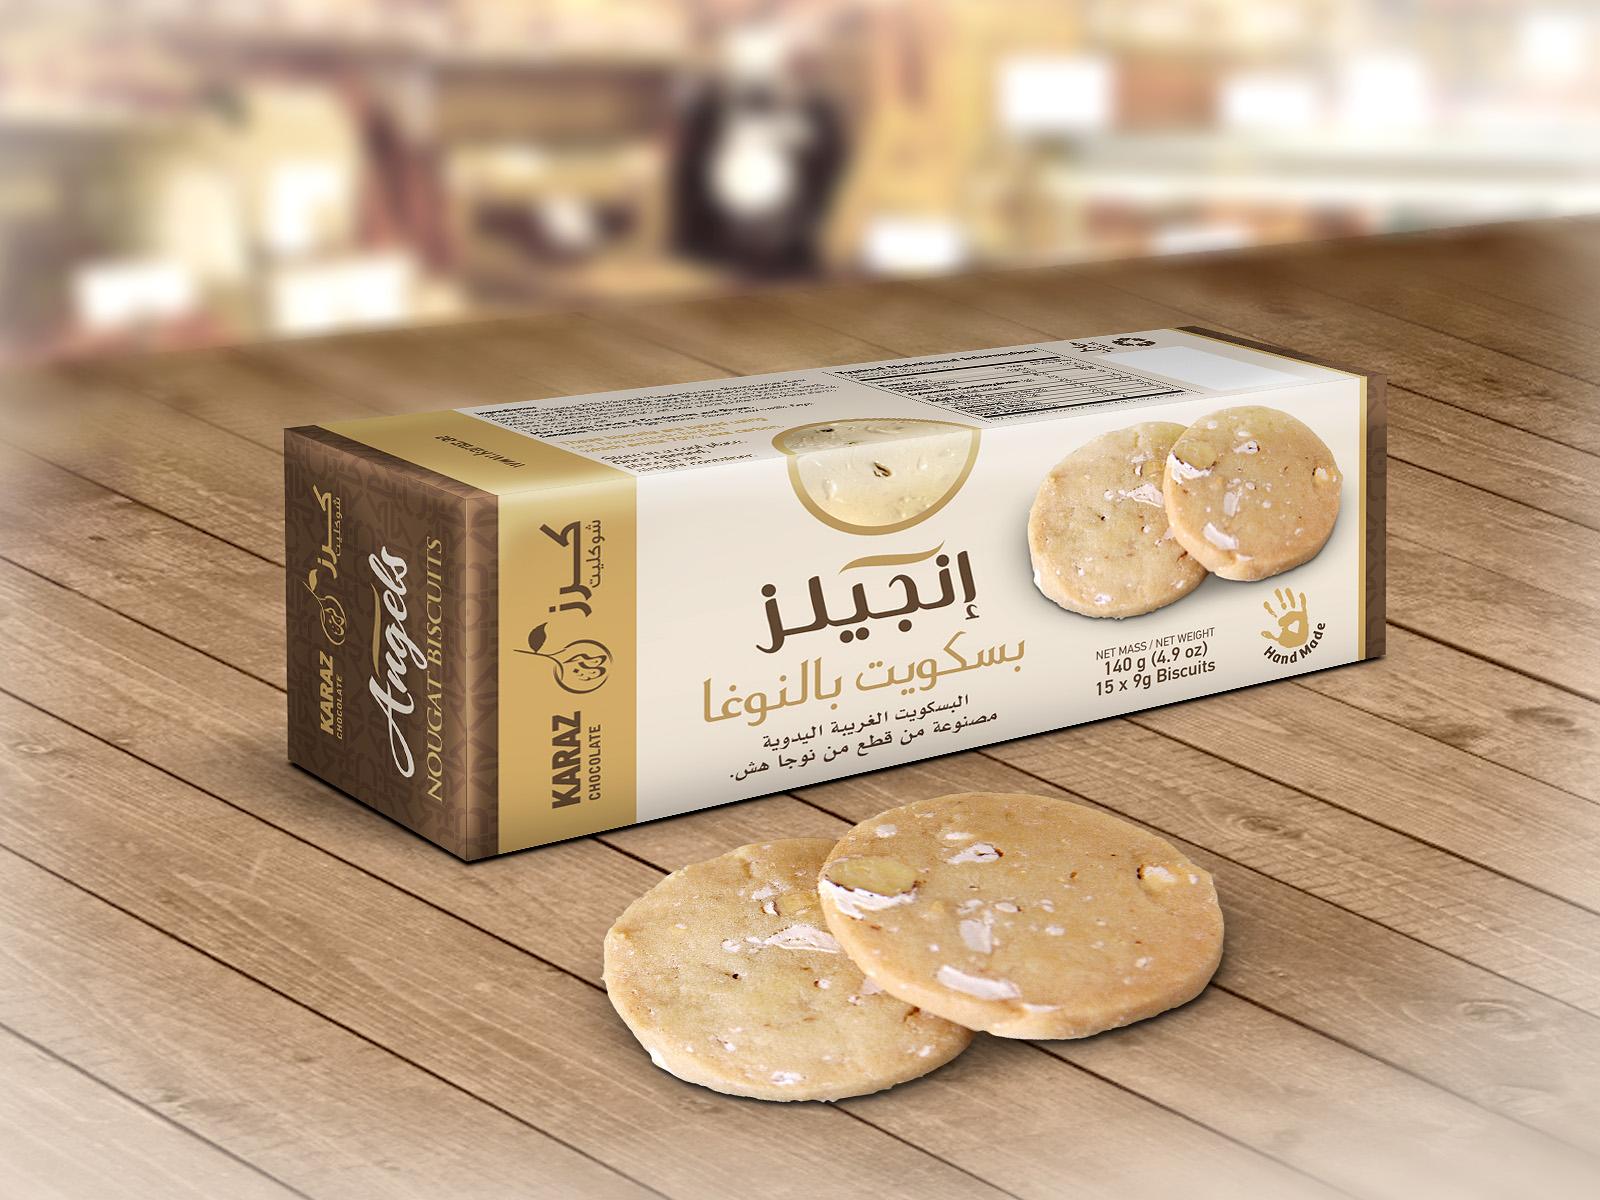 Nougat biscuits Box Design